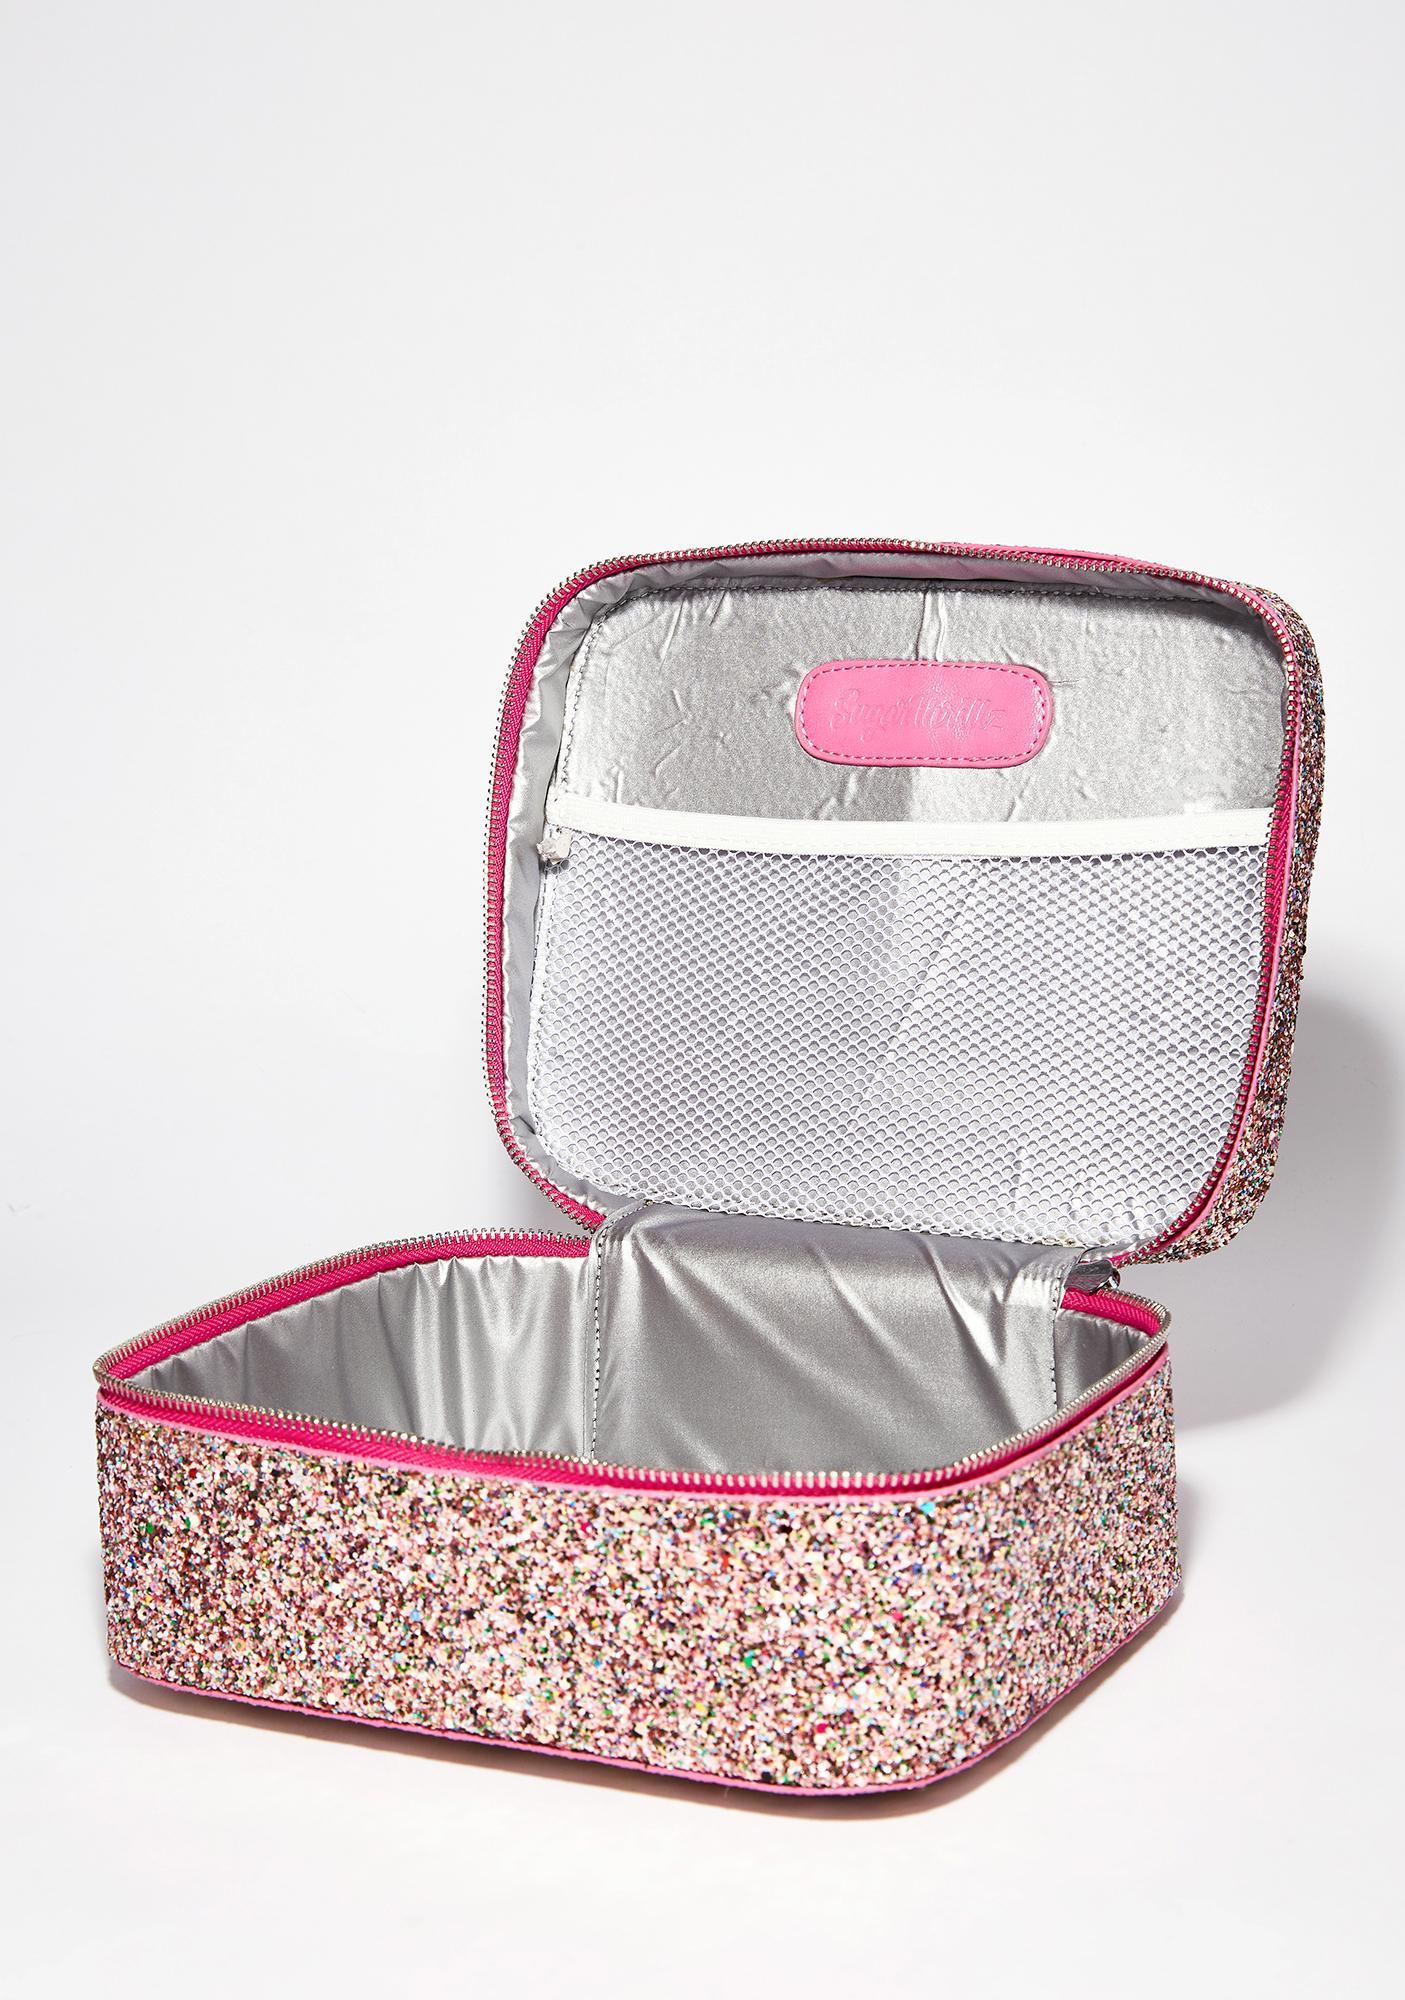 Sugar Thrillz Magical Mermaid Cosmetic Bag